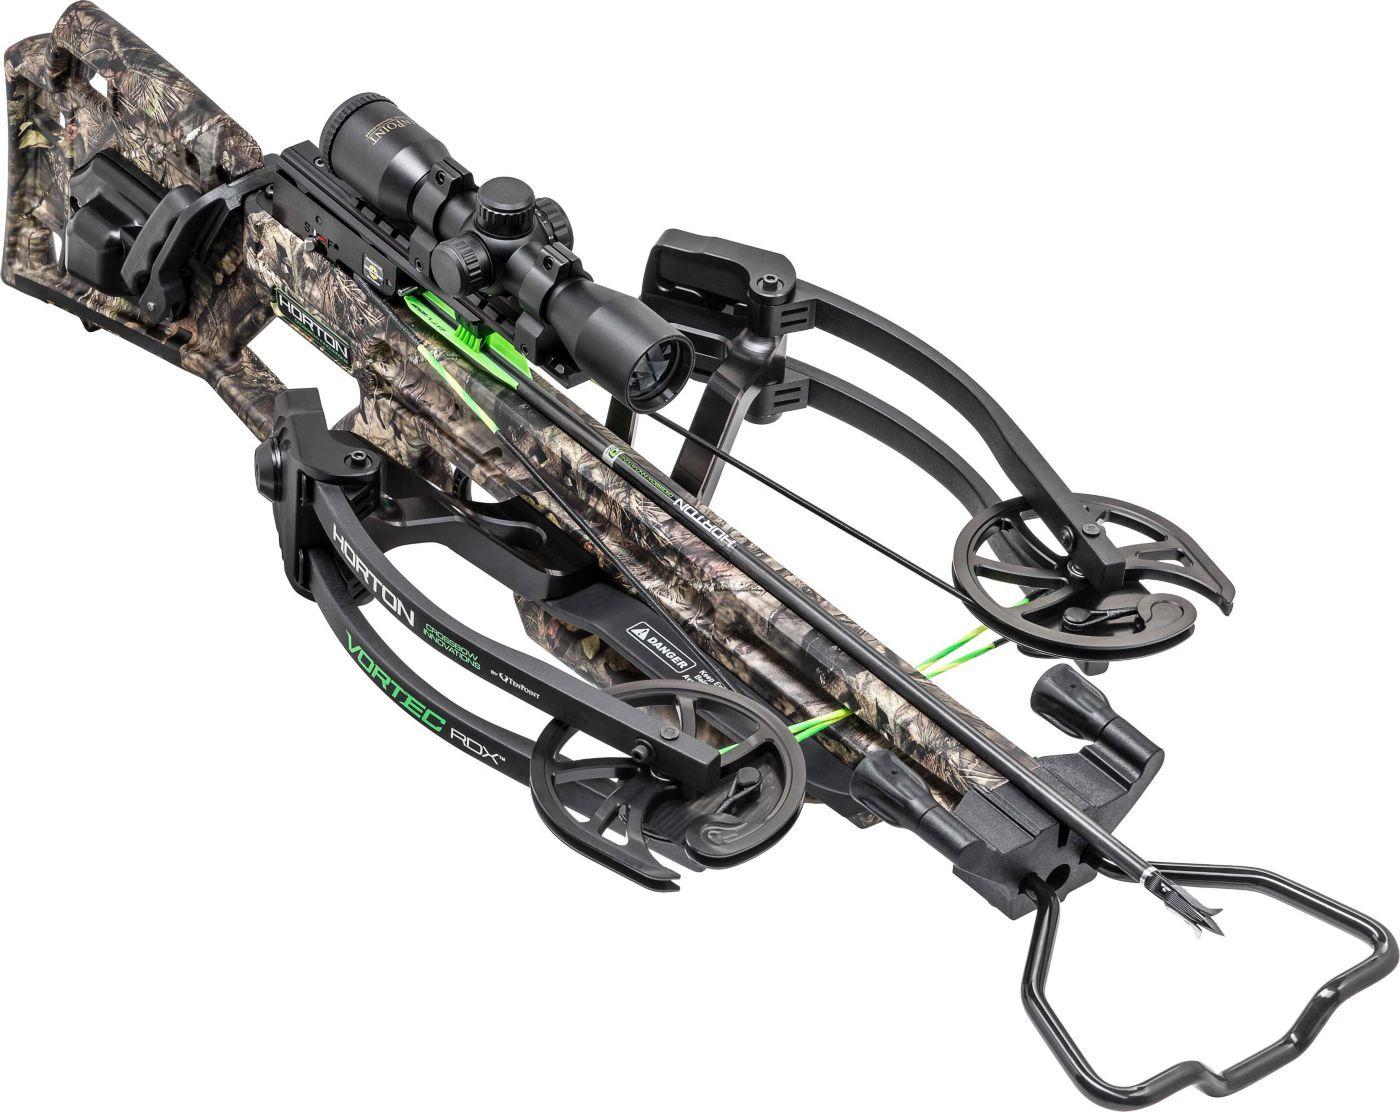 Horton Voretc RDX Crossbow Package – AcuDraw 50 Sled